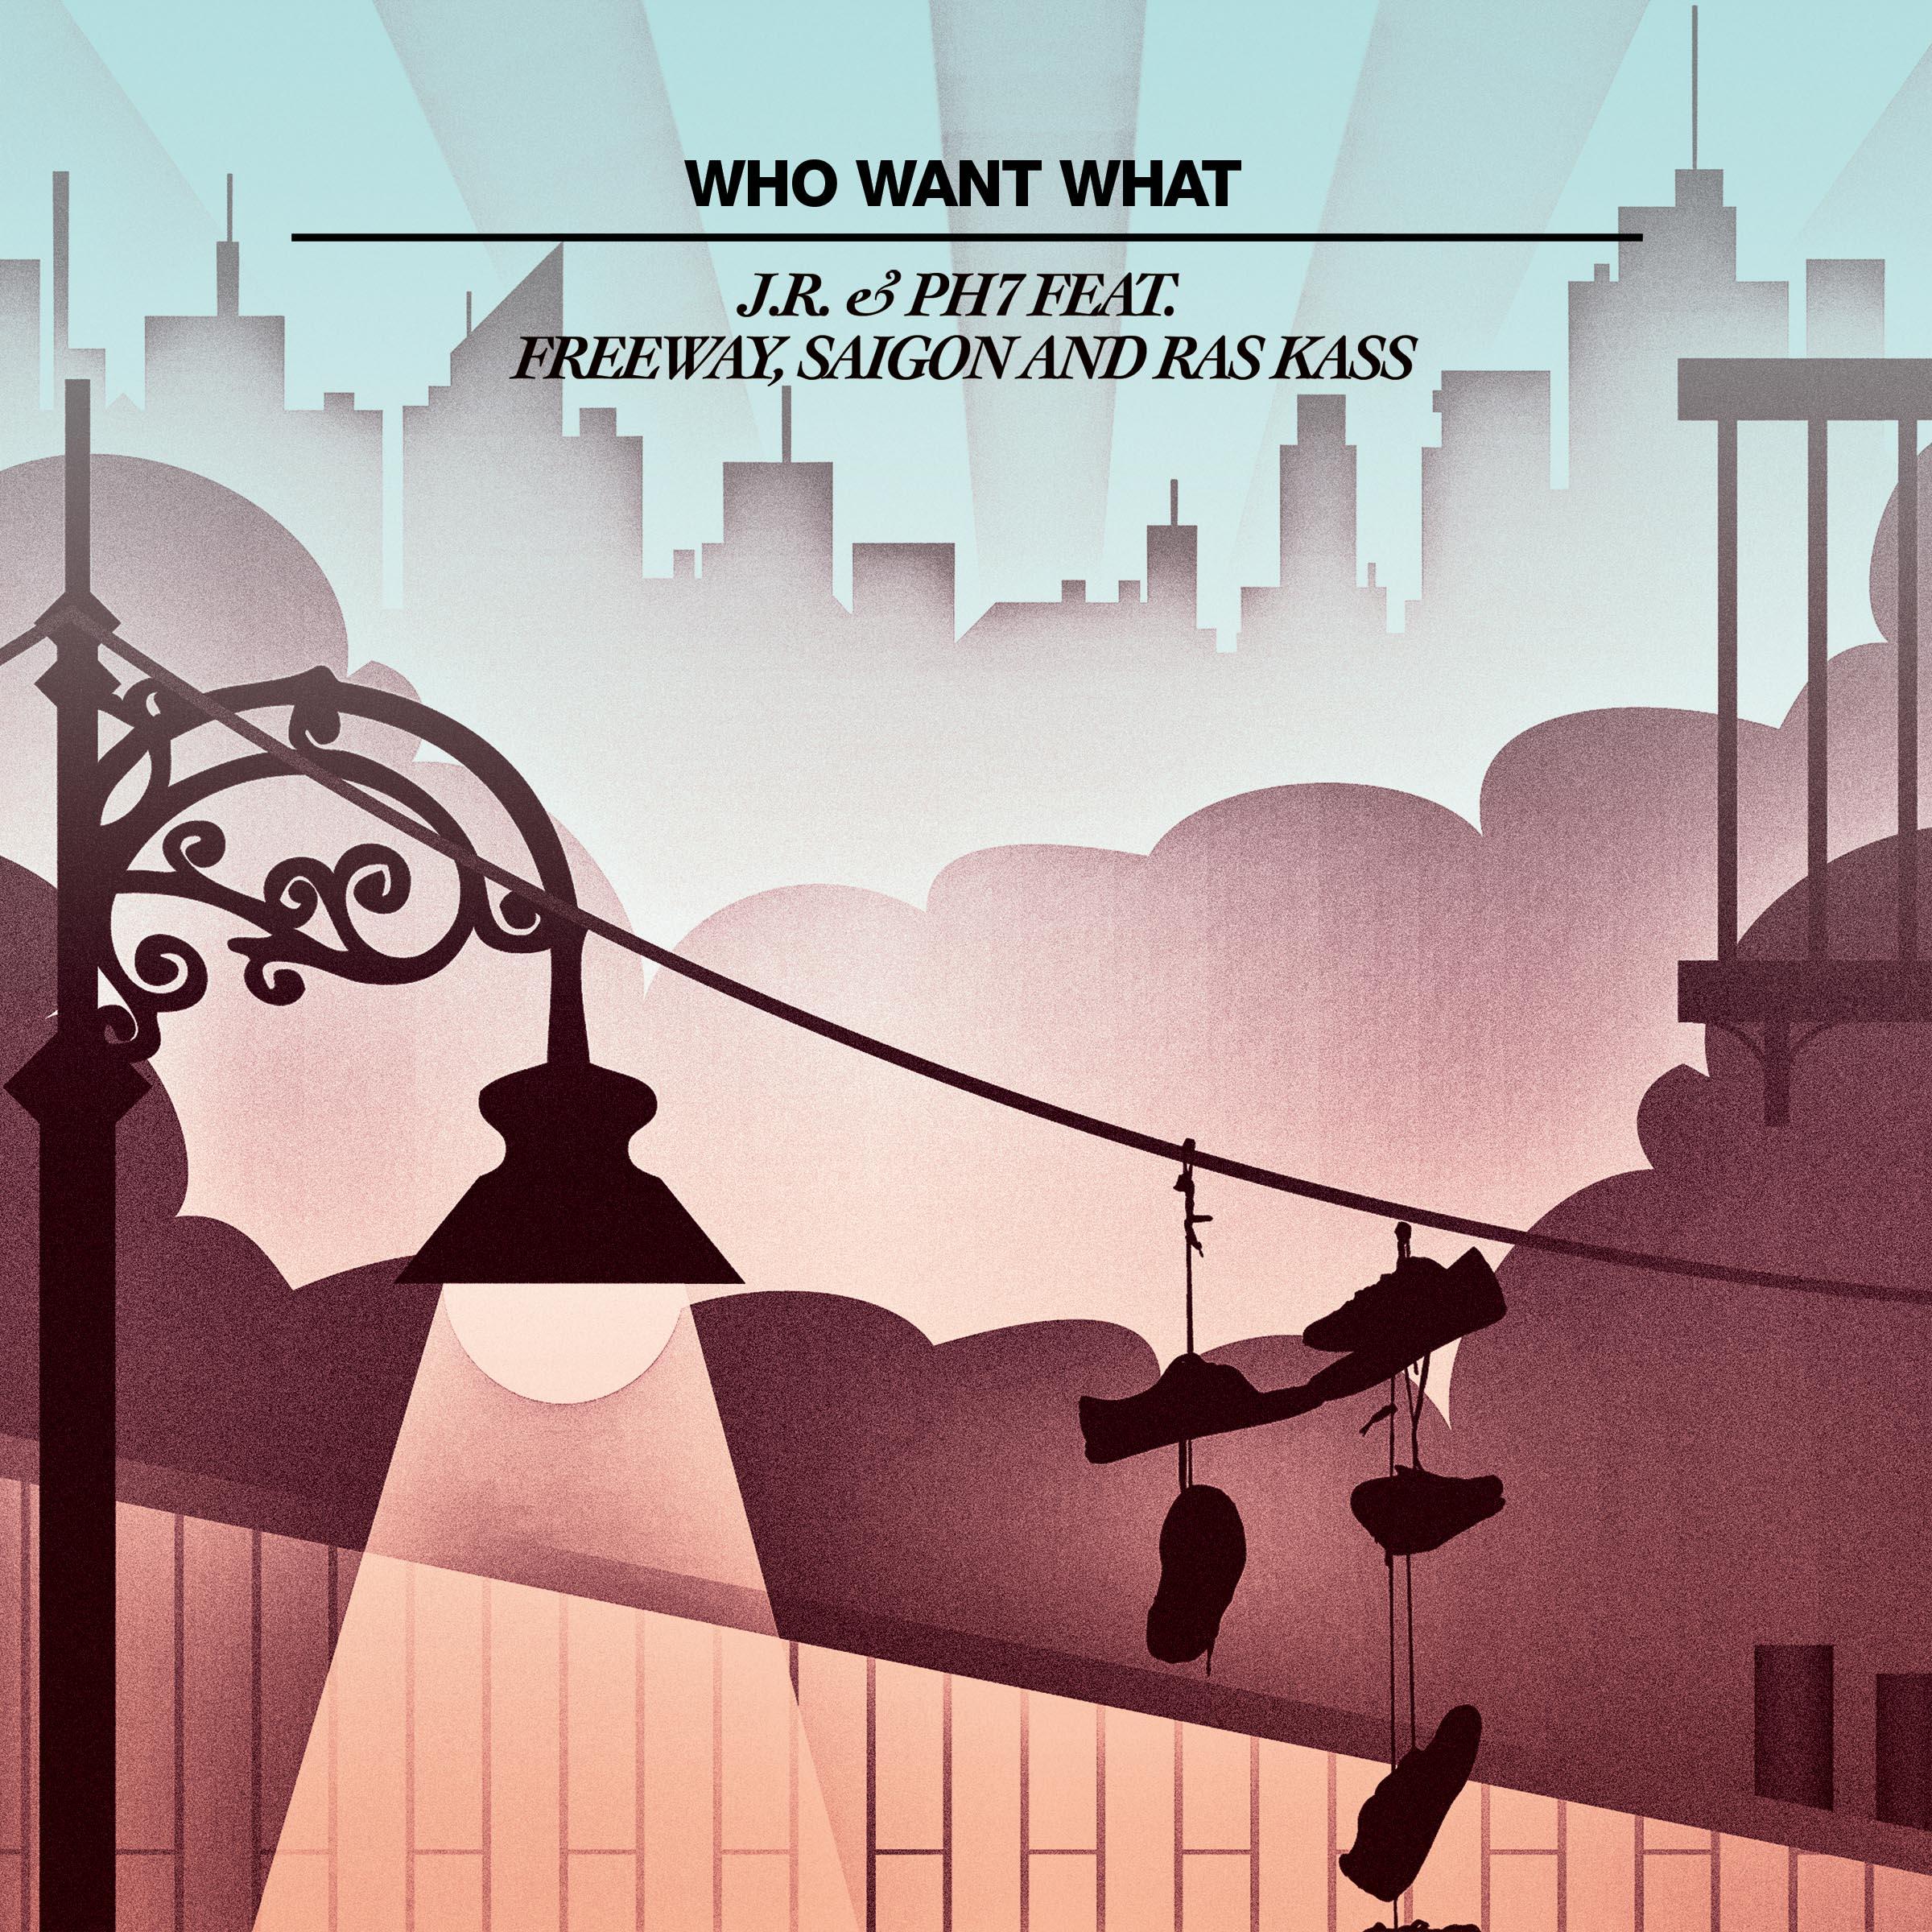 JR & PH7 - Who Want What feat. Freeway, Saigon & Ras Kass [audio]